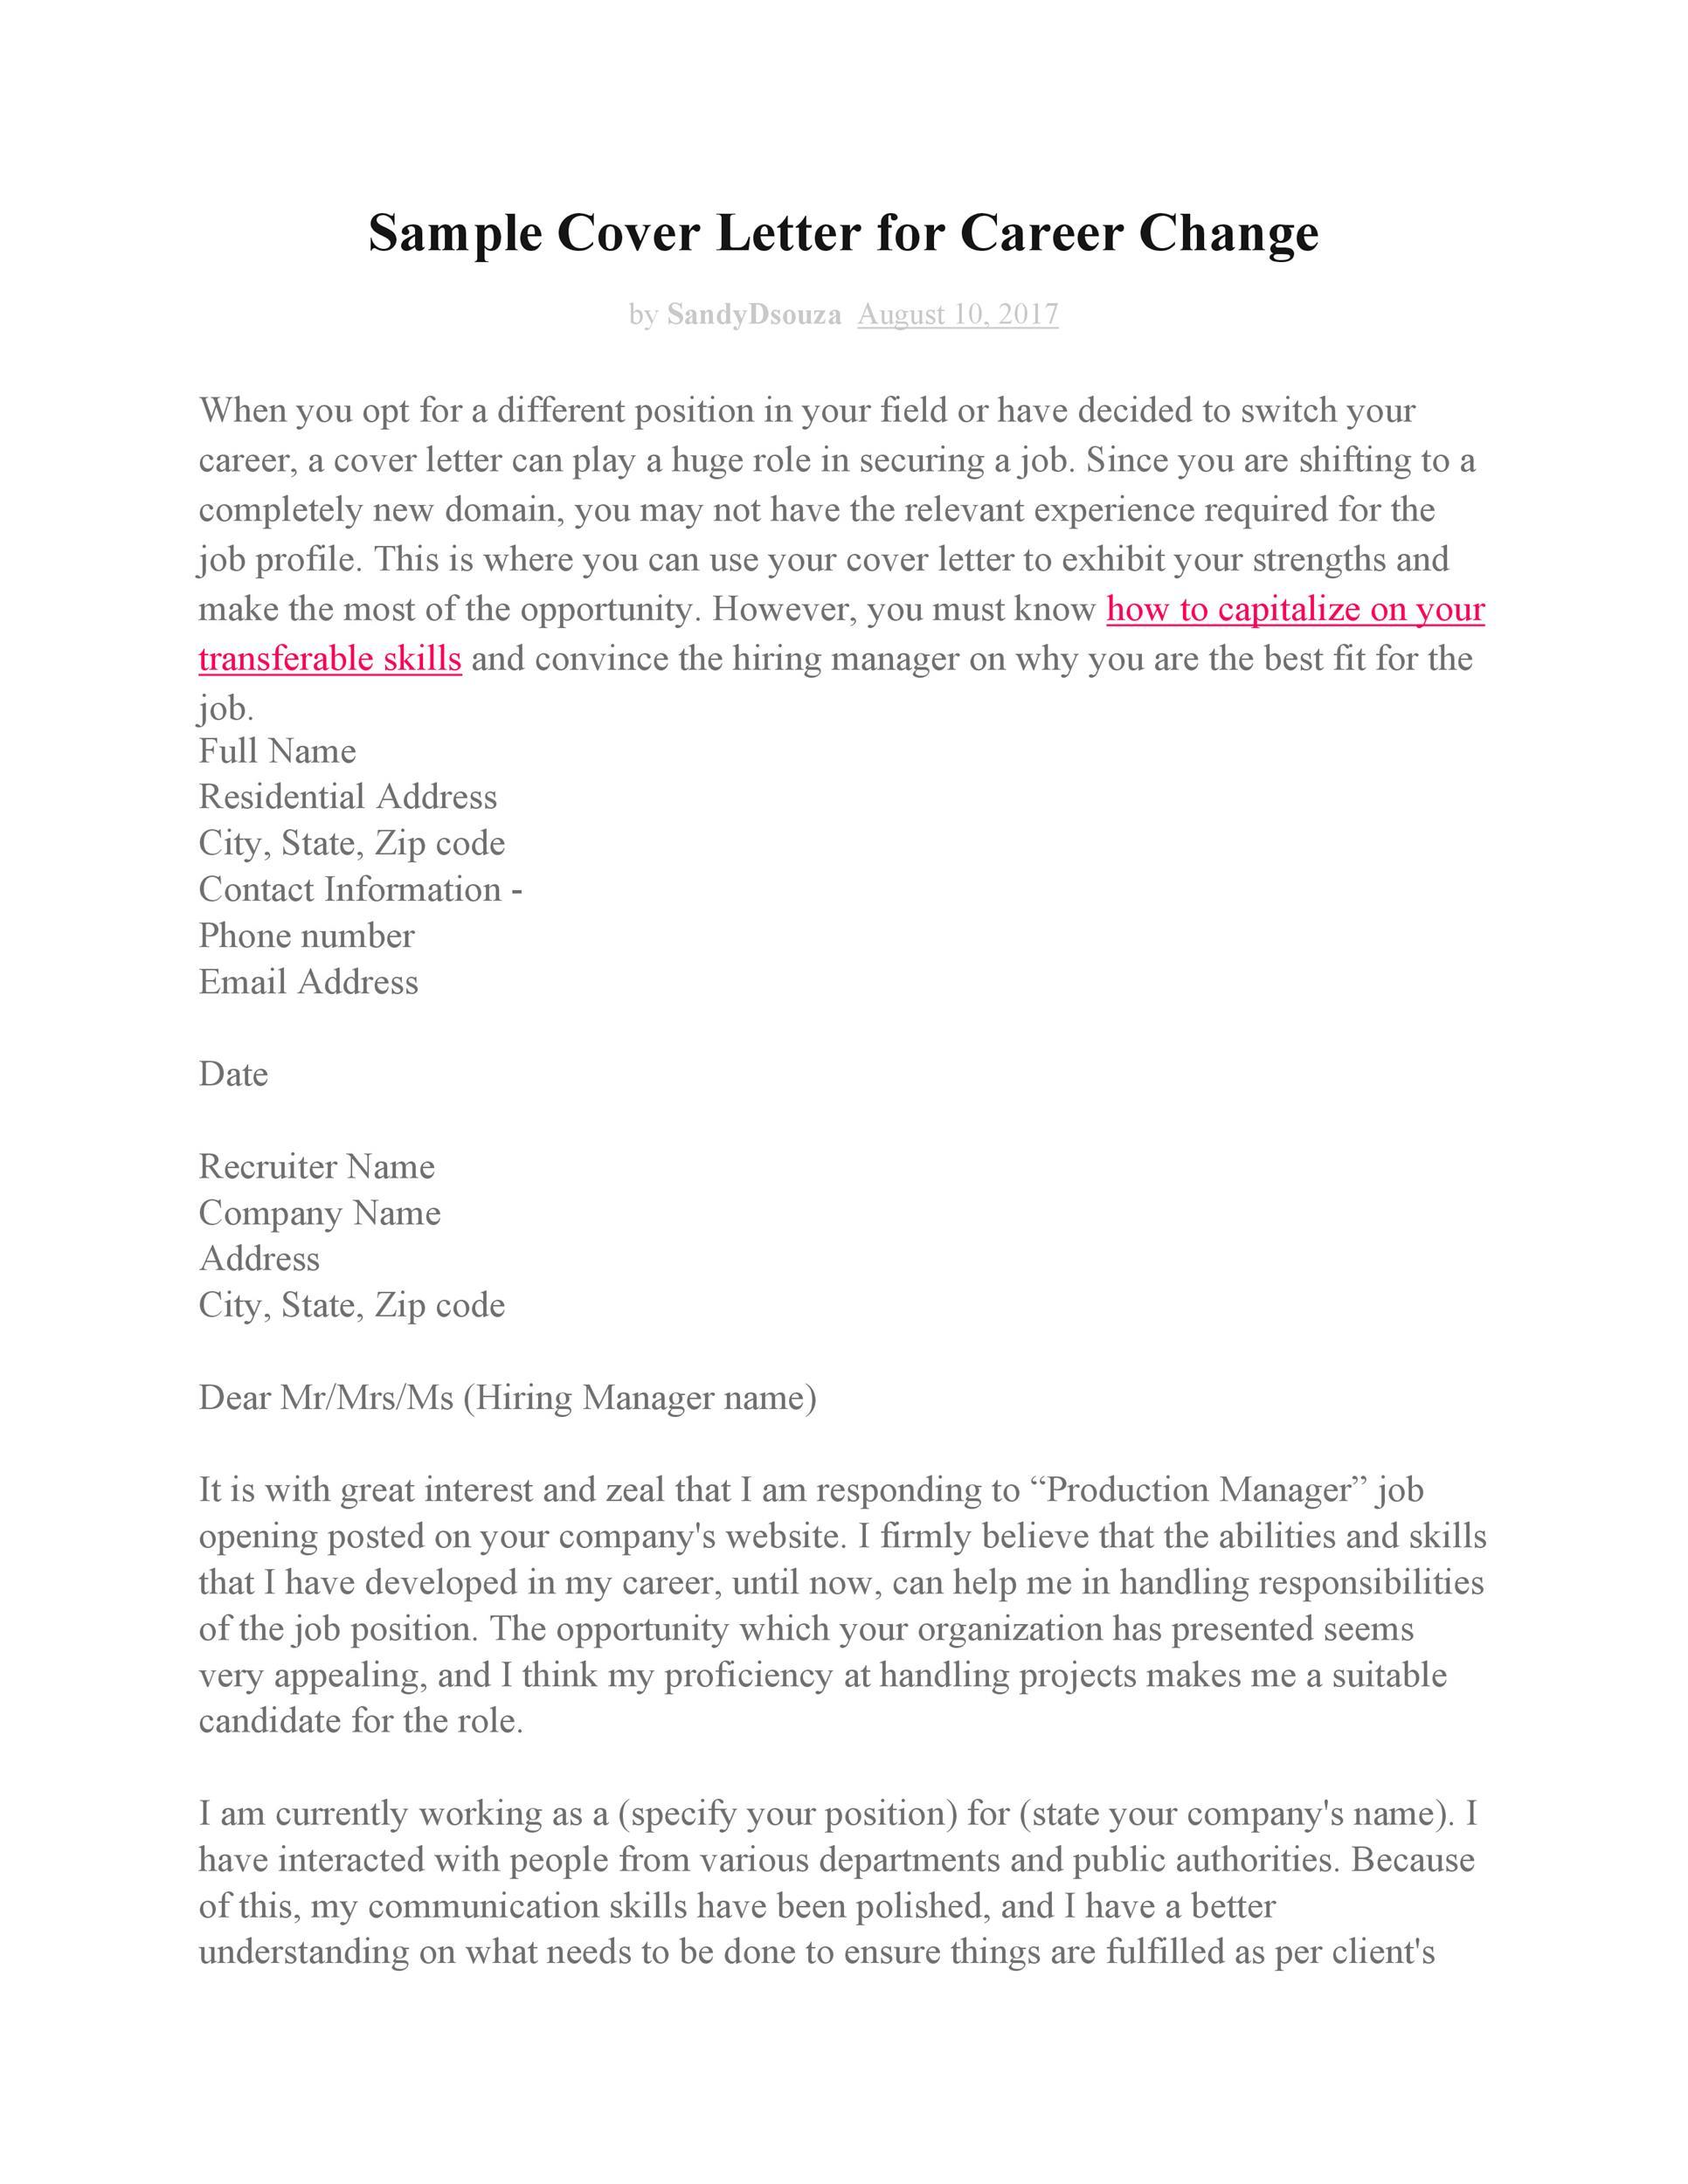 Free career change cover letter 13